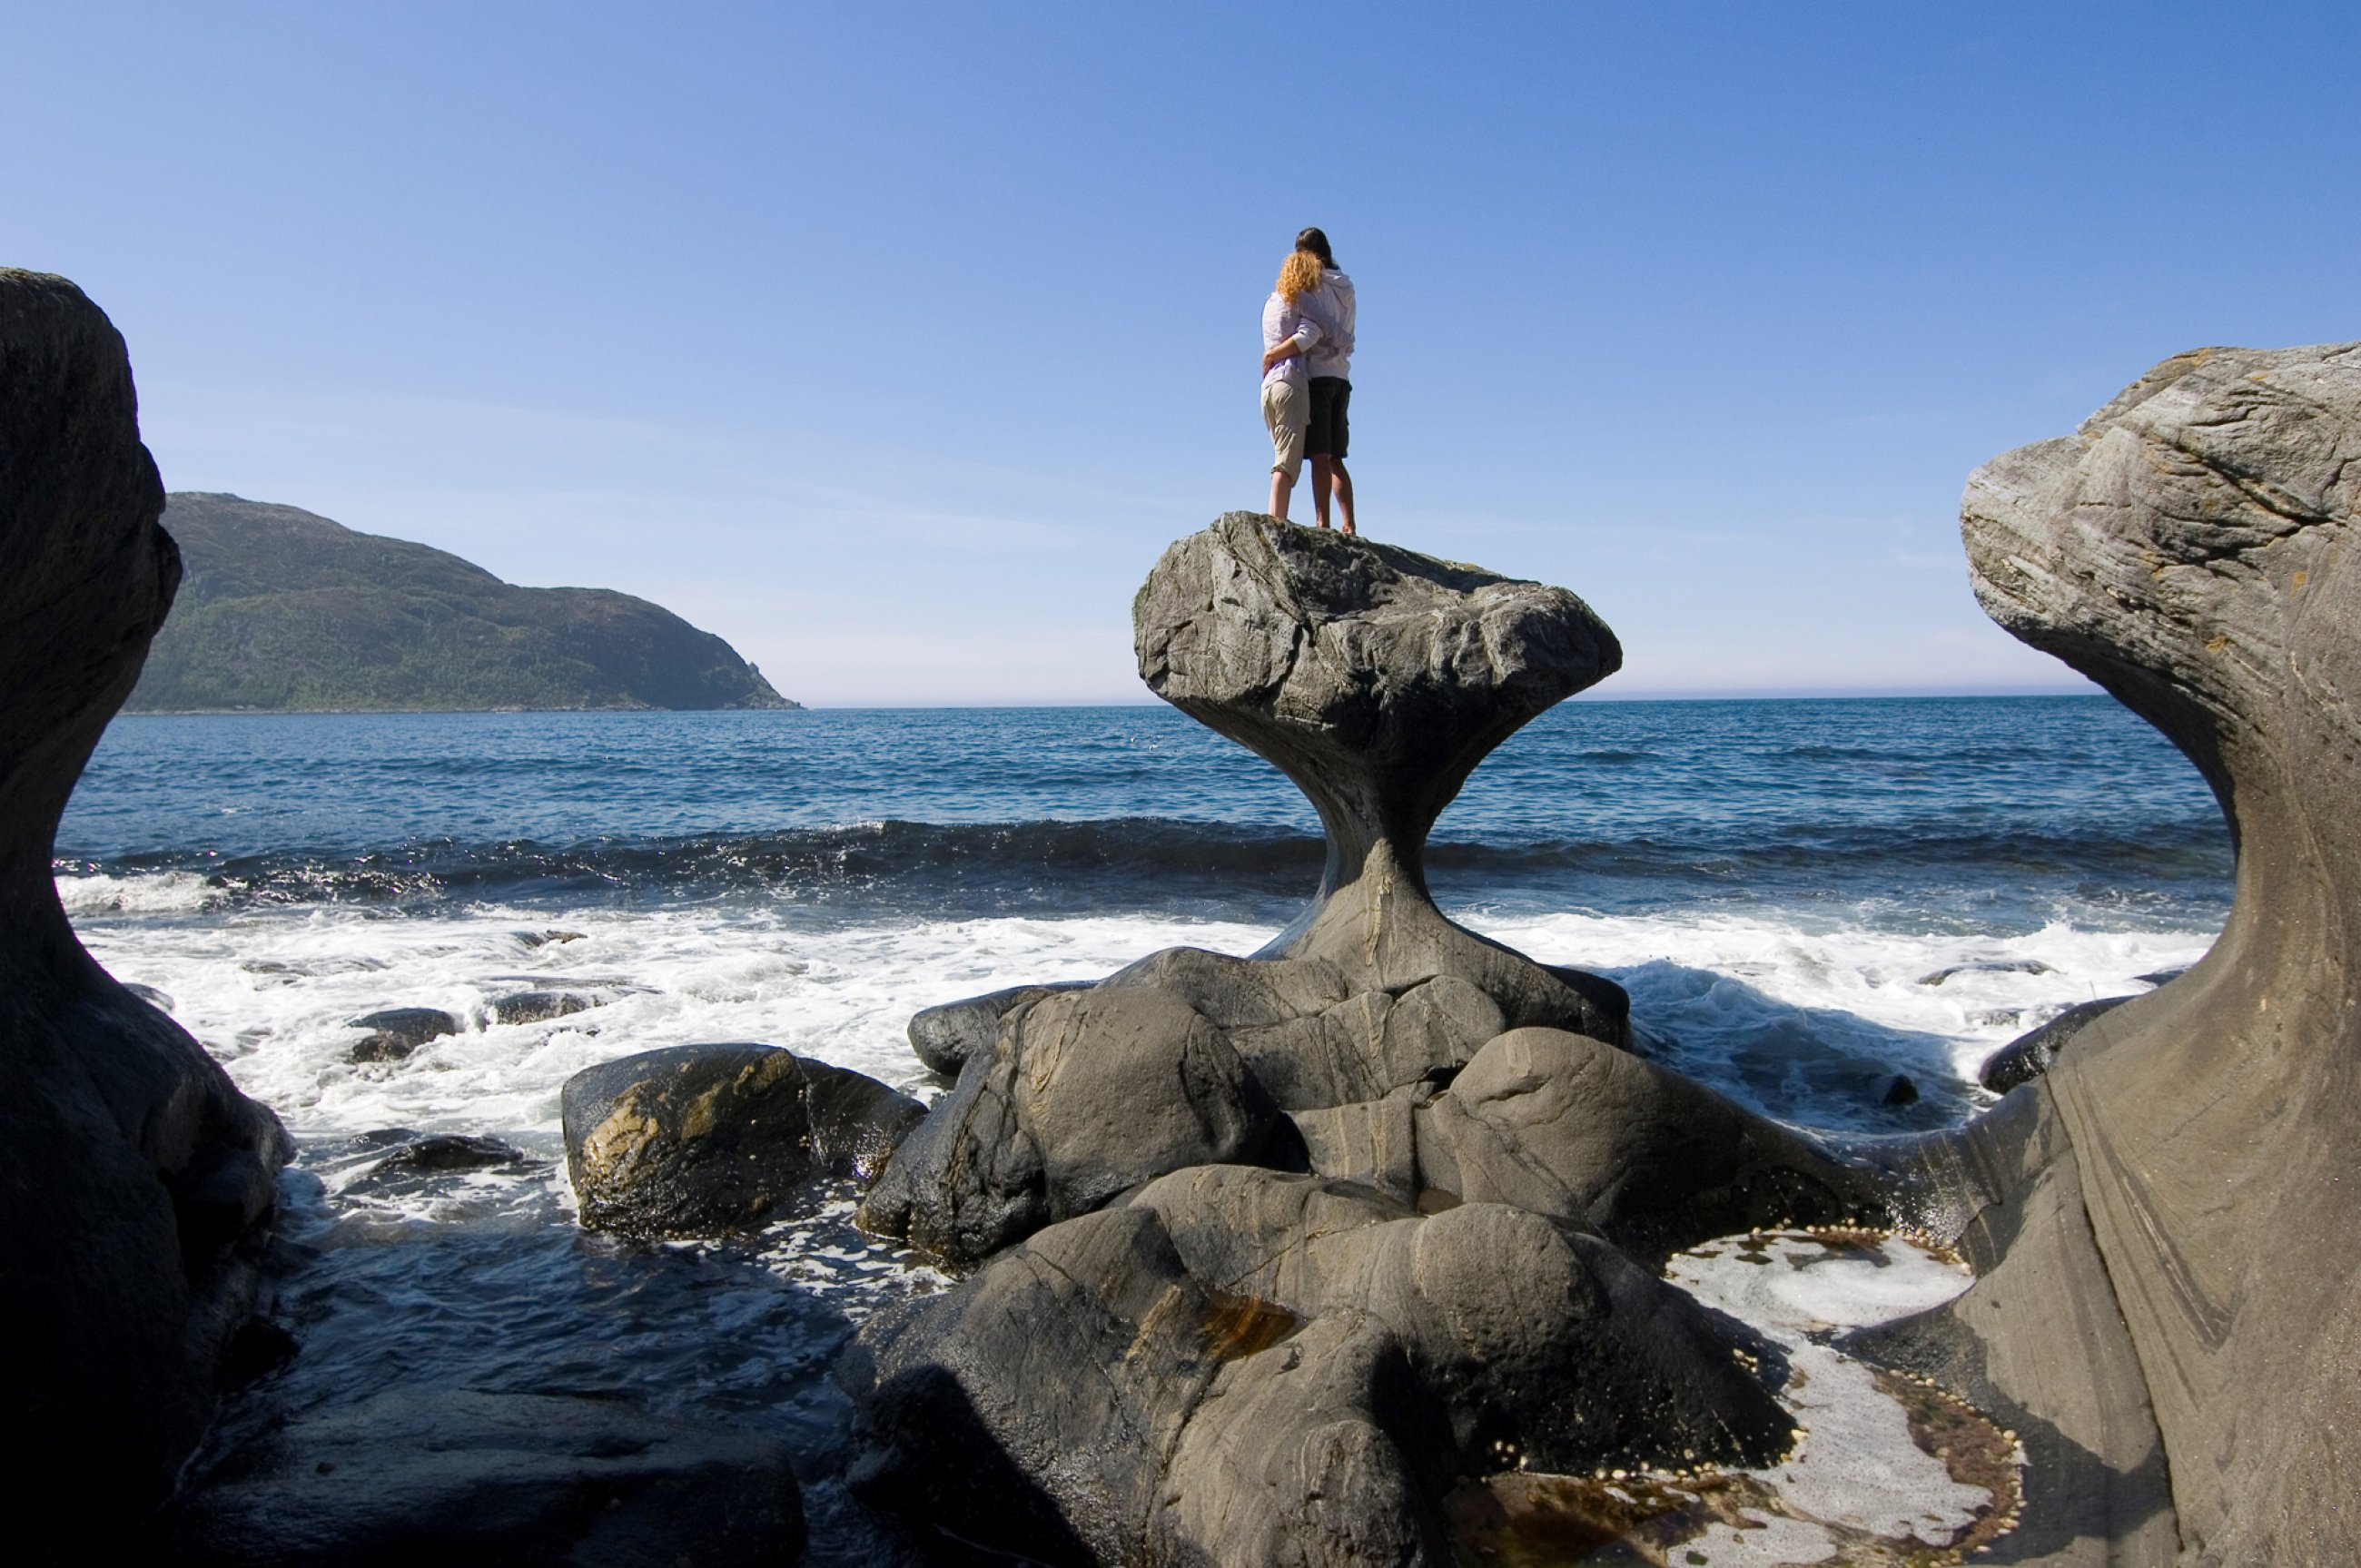 https://bubo.sk/uploads/galleries/7531/maloy-rock-terje-rakke-nordic-life-as-fjord-norway.jpg